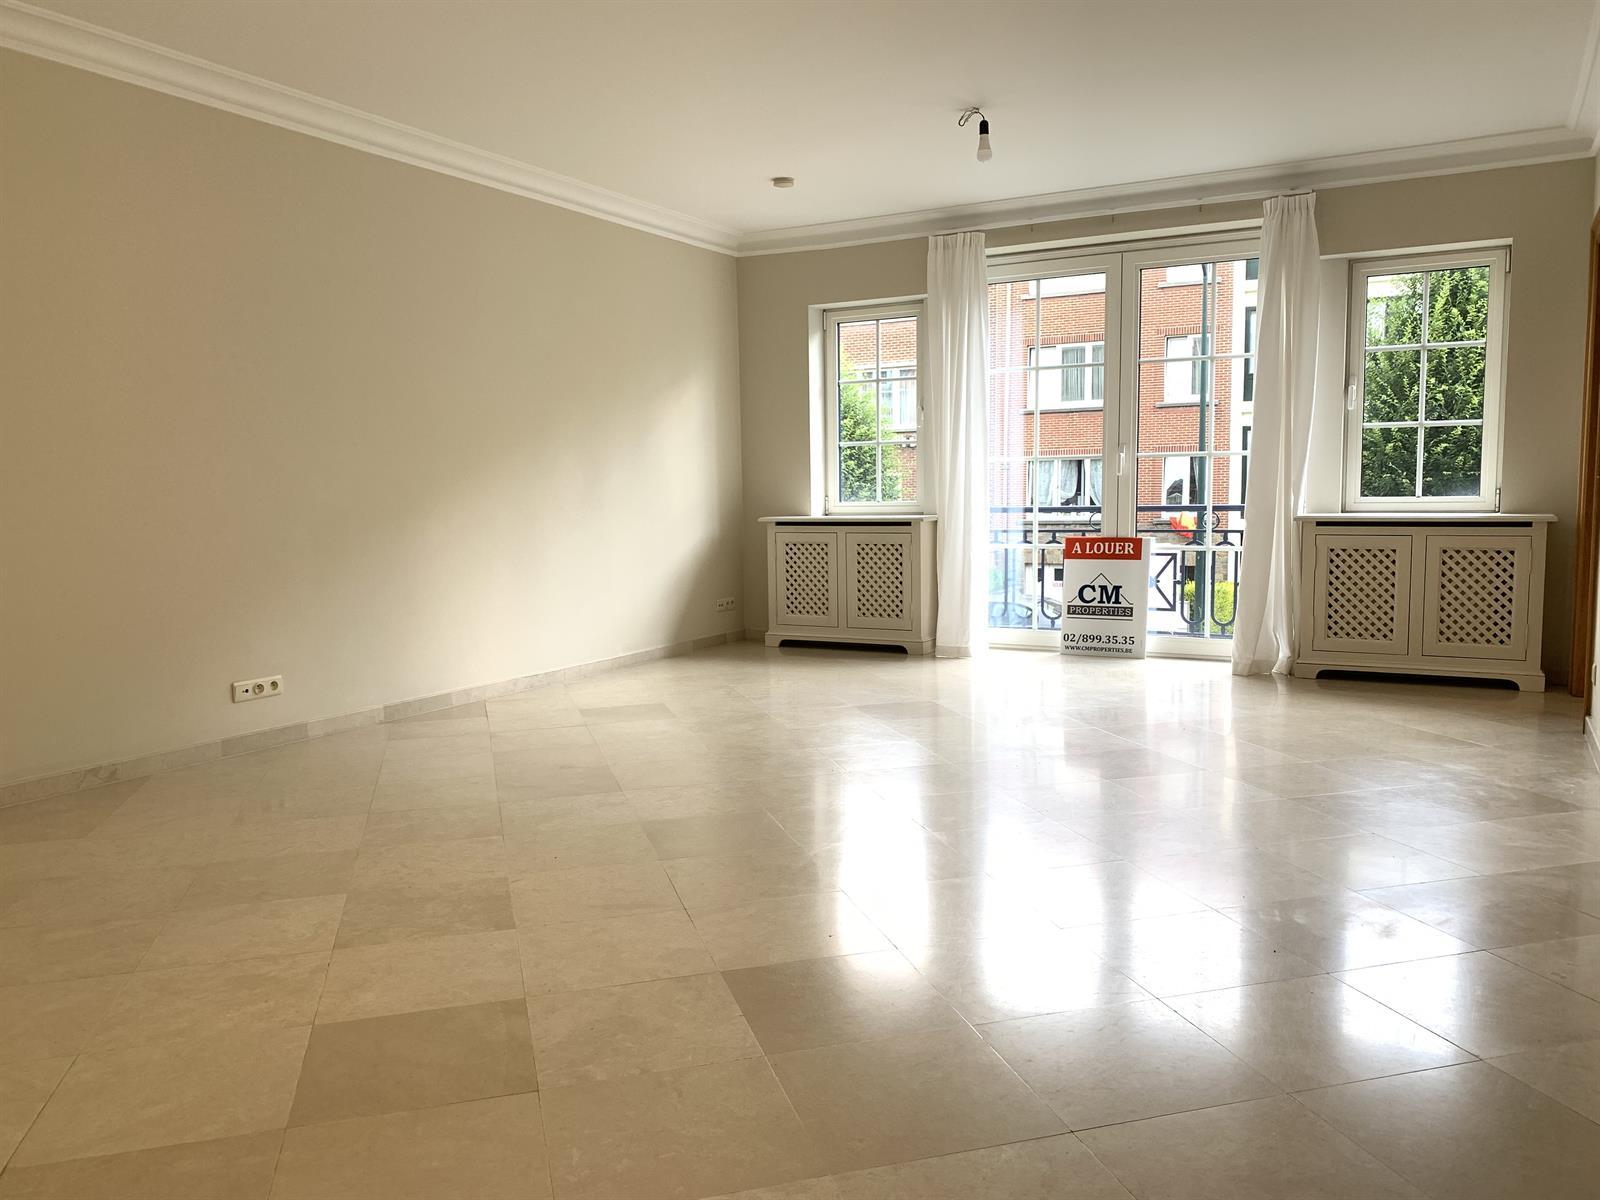 Appartement exceptionnel - Woluwe-Saint-Pierre - #4433539-21